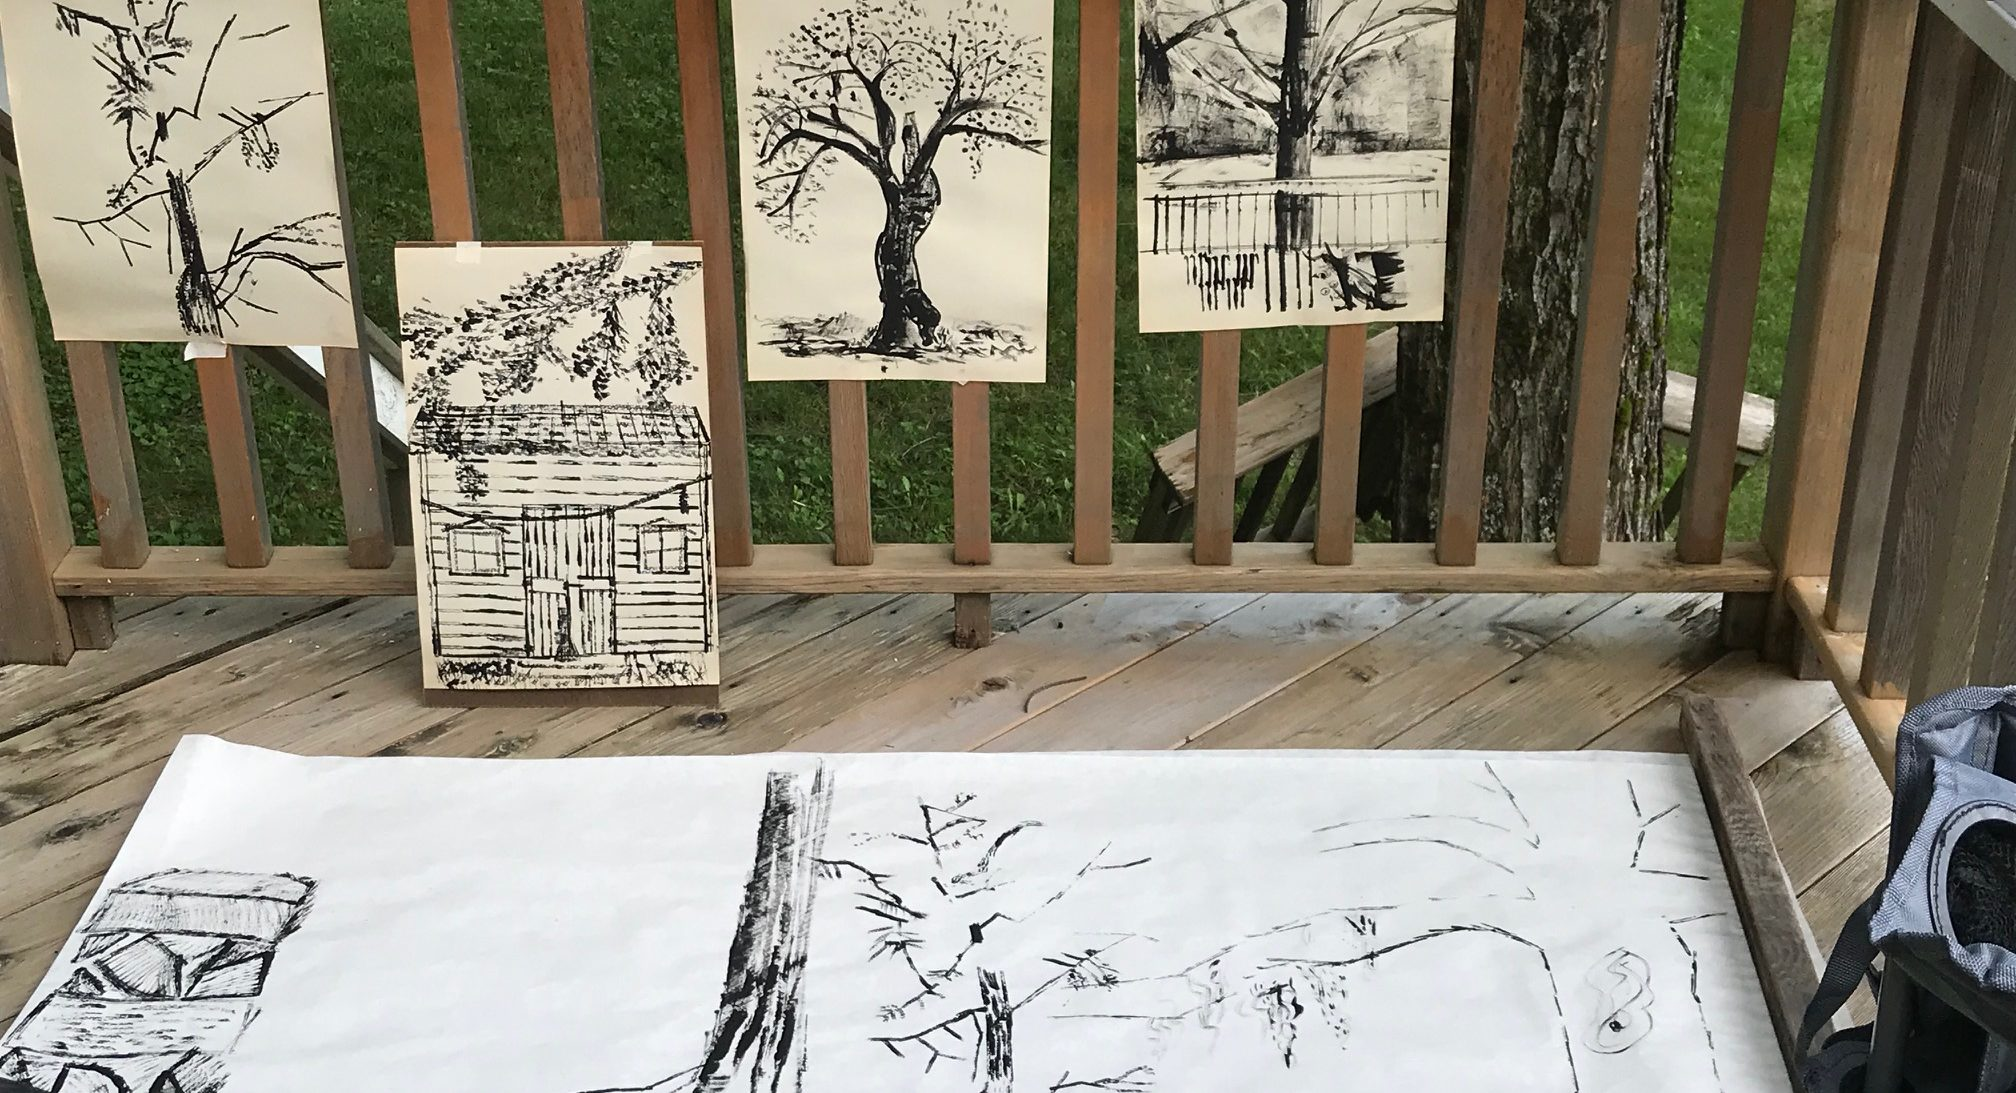 paintings hanging